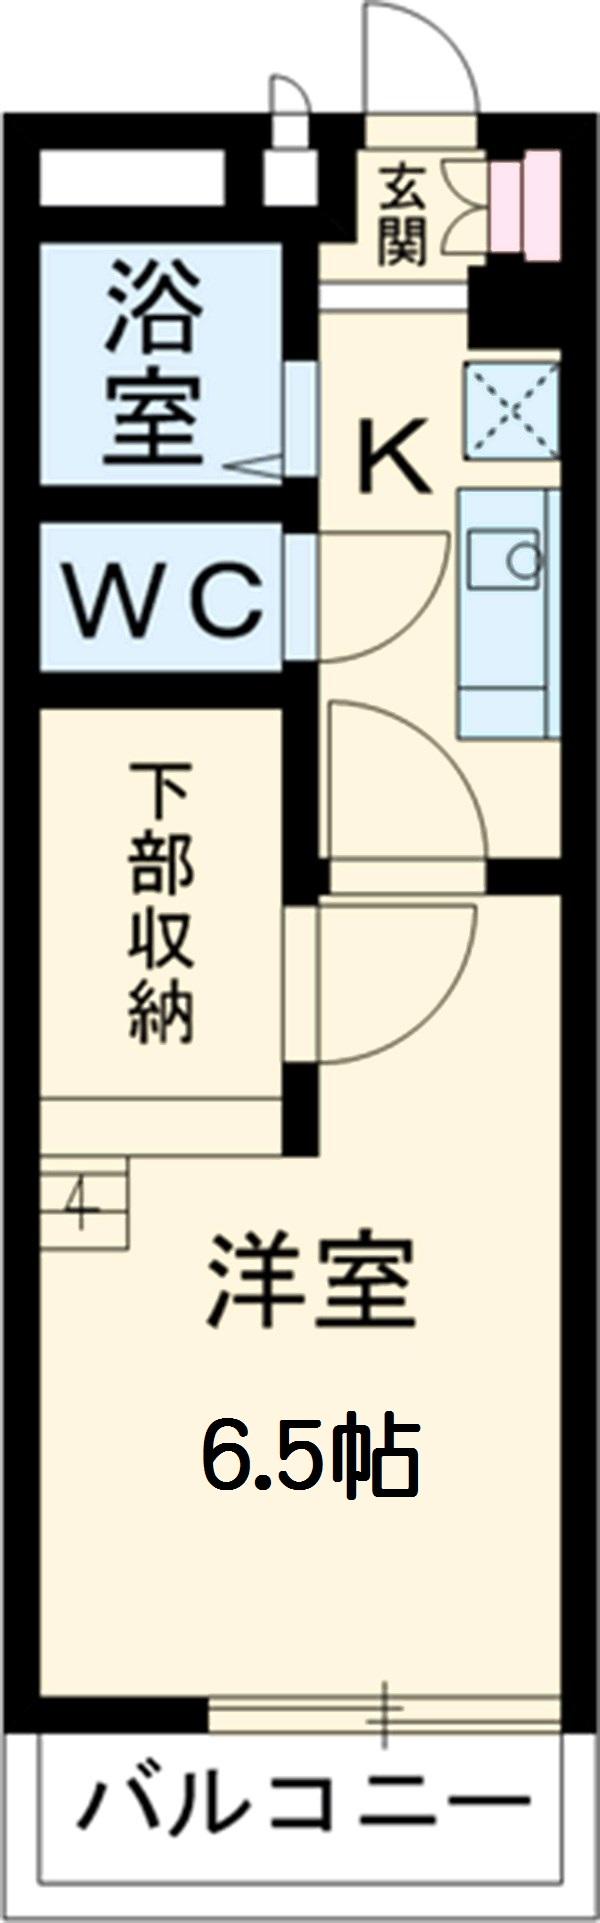 OMレジデンス上飯田・113号室の間取り